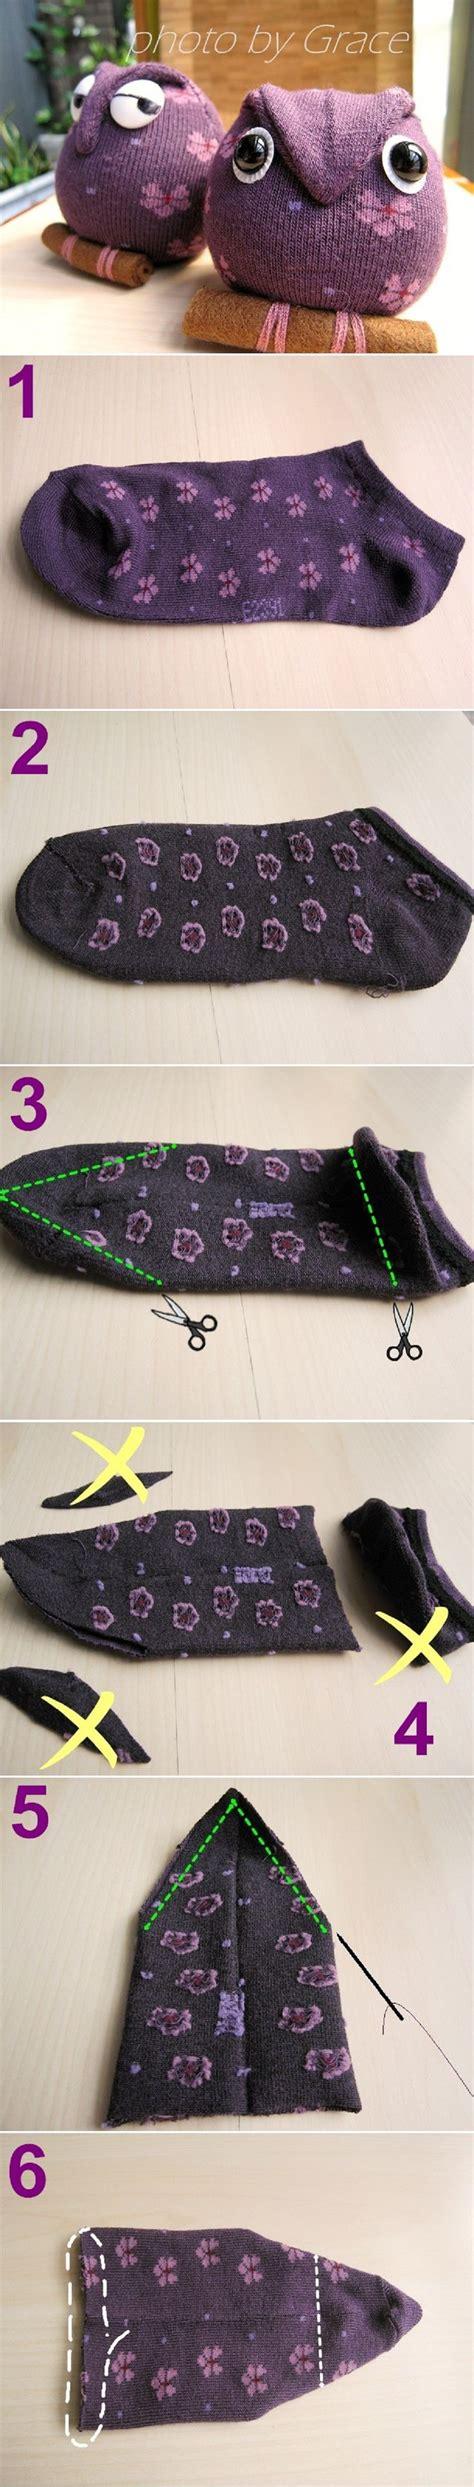 Kaos Dont See Monkey 25 best ideas about sock toys on sock dolls